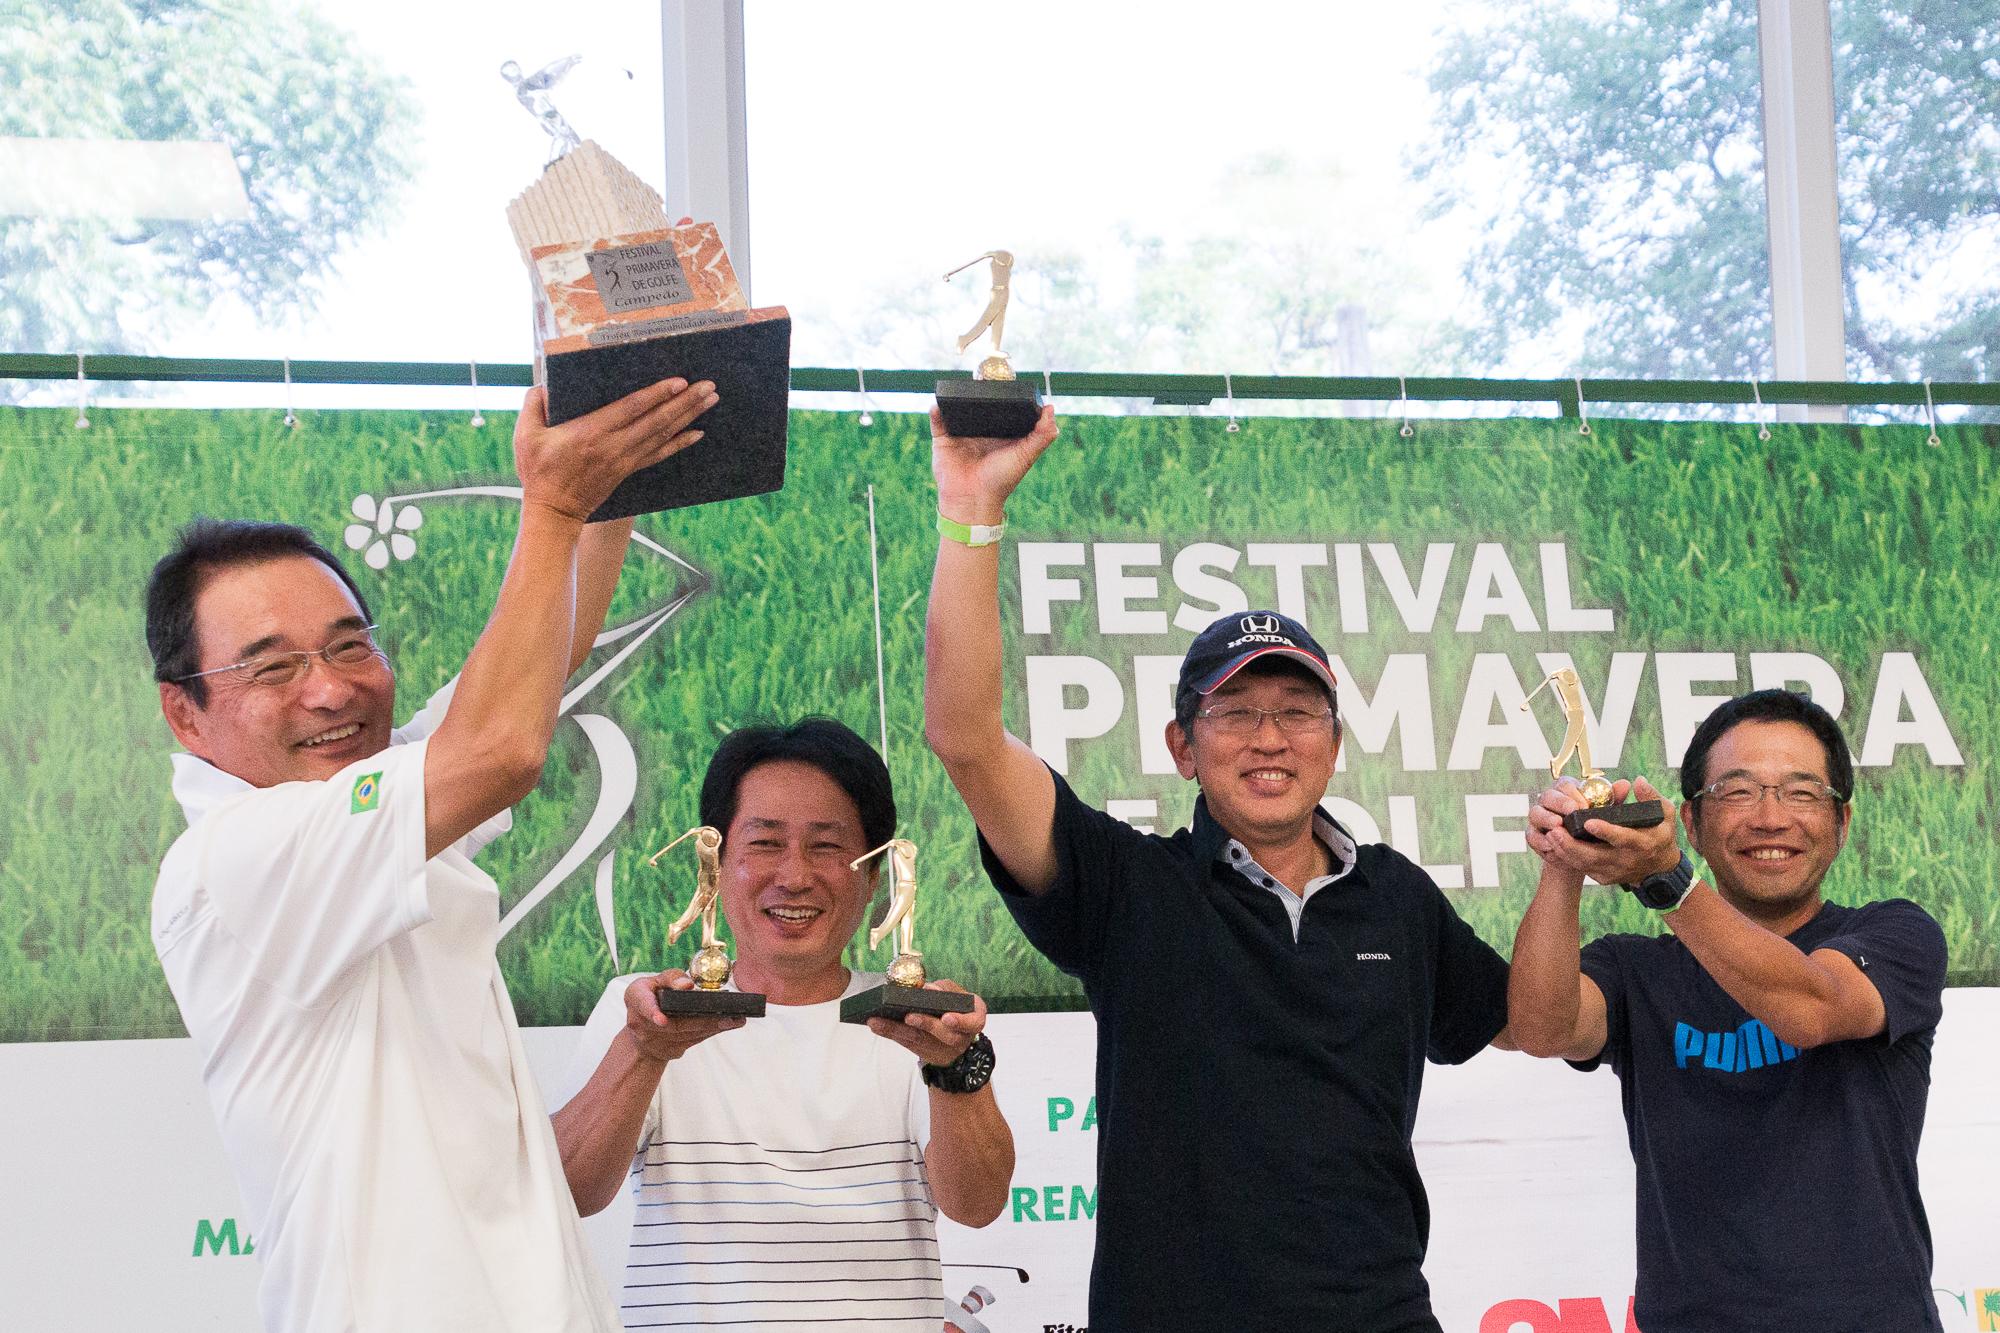 16 Festival Primavera de Golfe.jpg